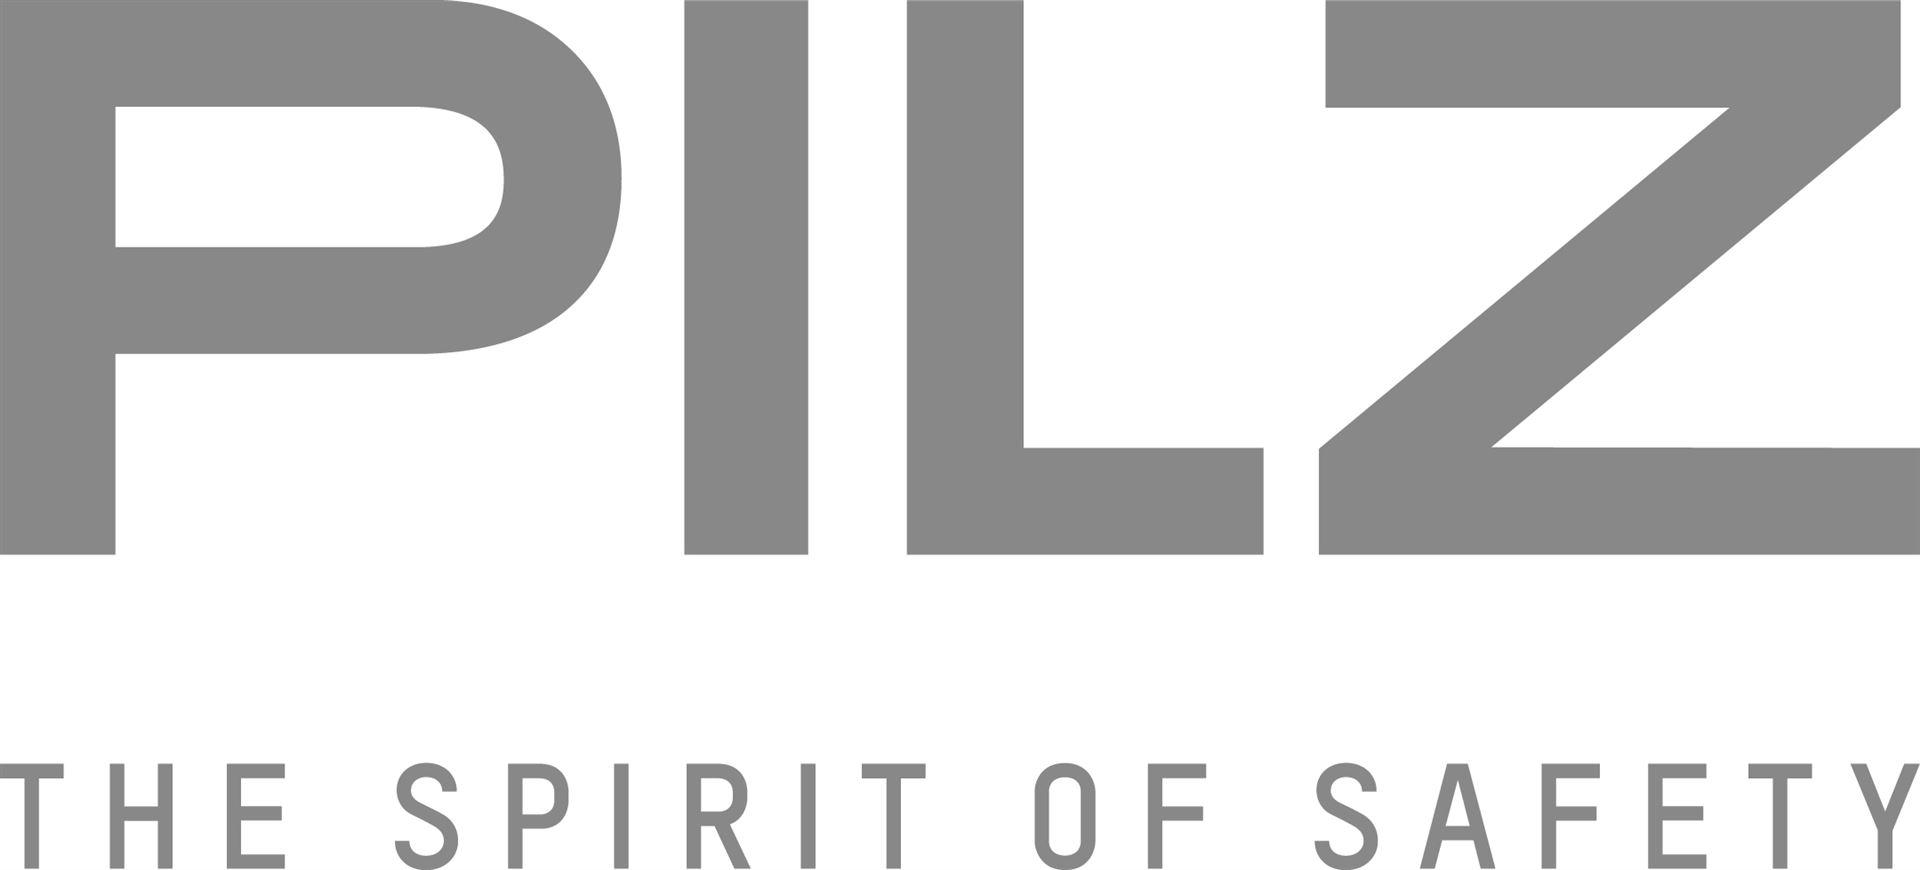 Pilz GmbH & Co.KG